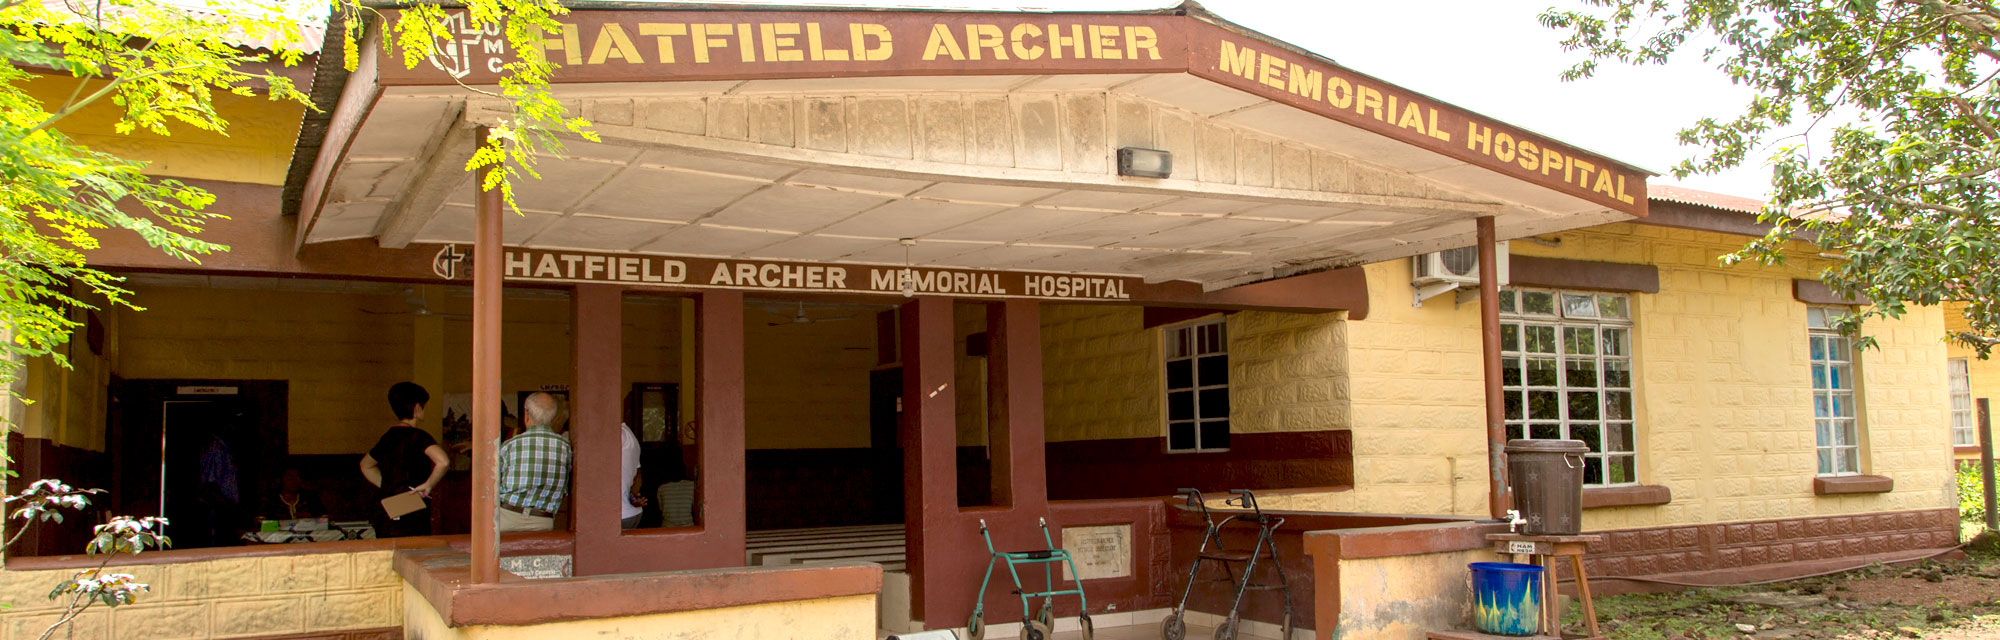 Hatfield-Archer-Memorial-Hospital-Rotifunk-Sierra-Leone